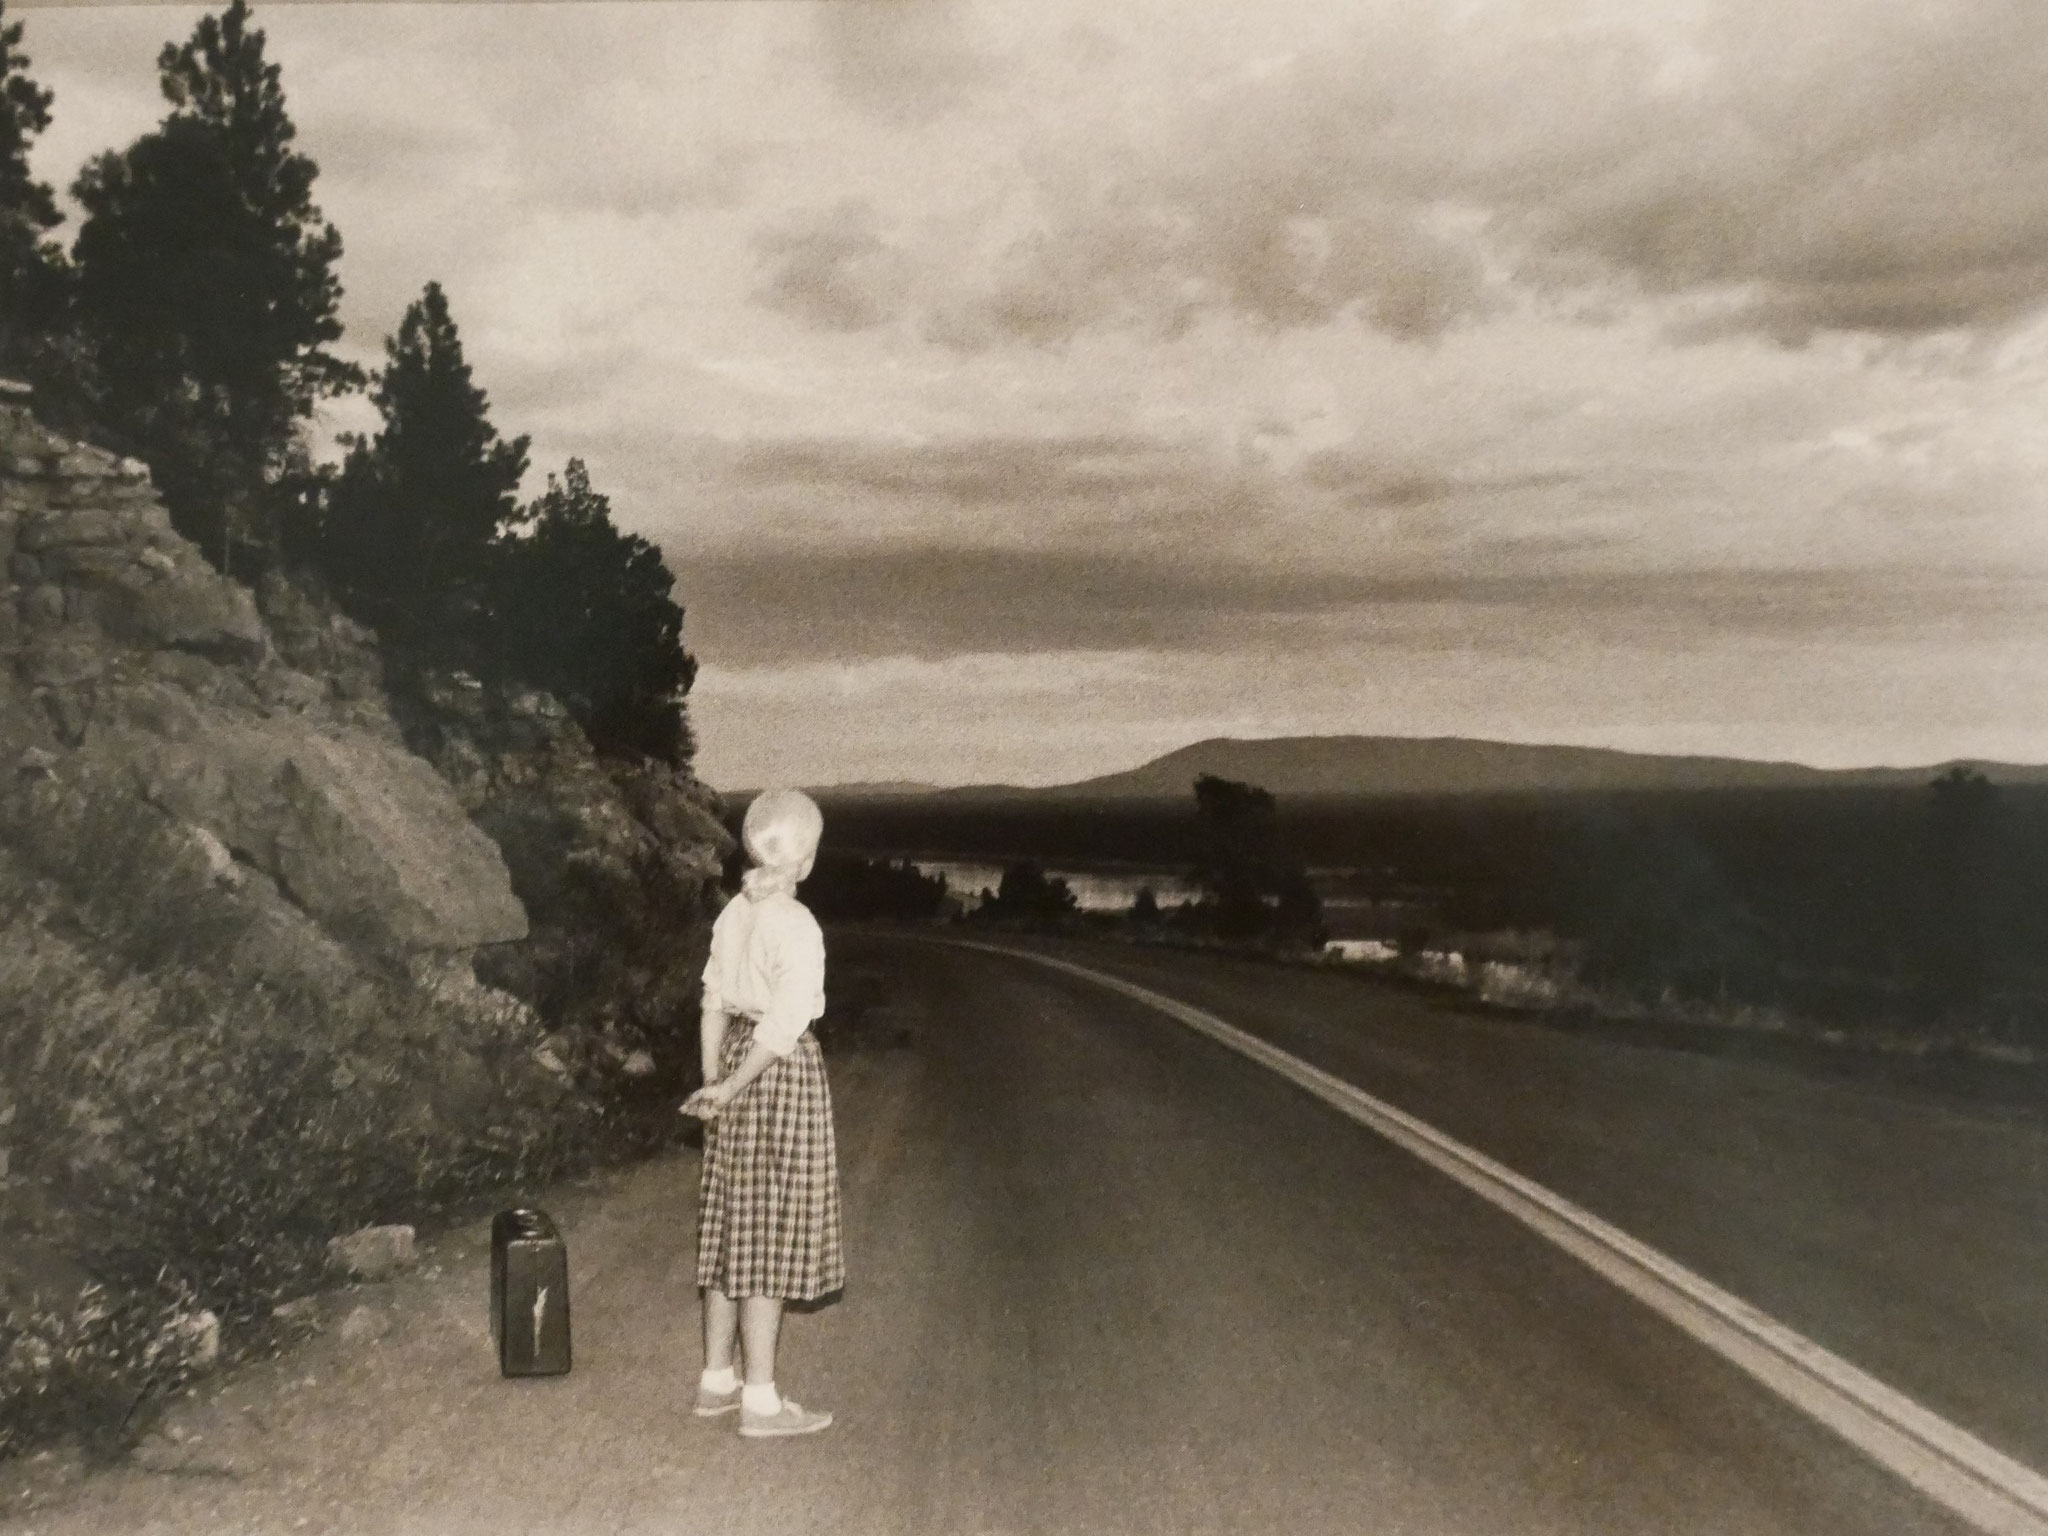 Cindy Sherman, Untitled Film Still #48, 1979